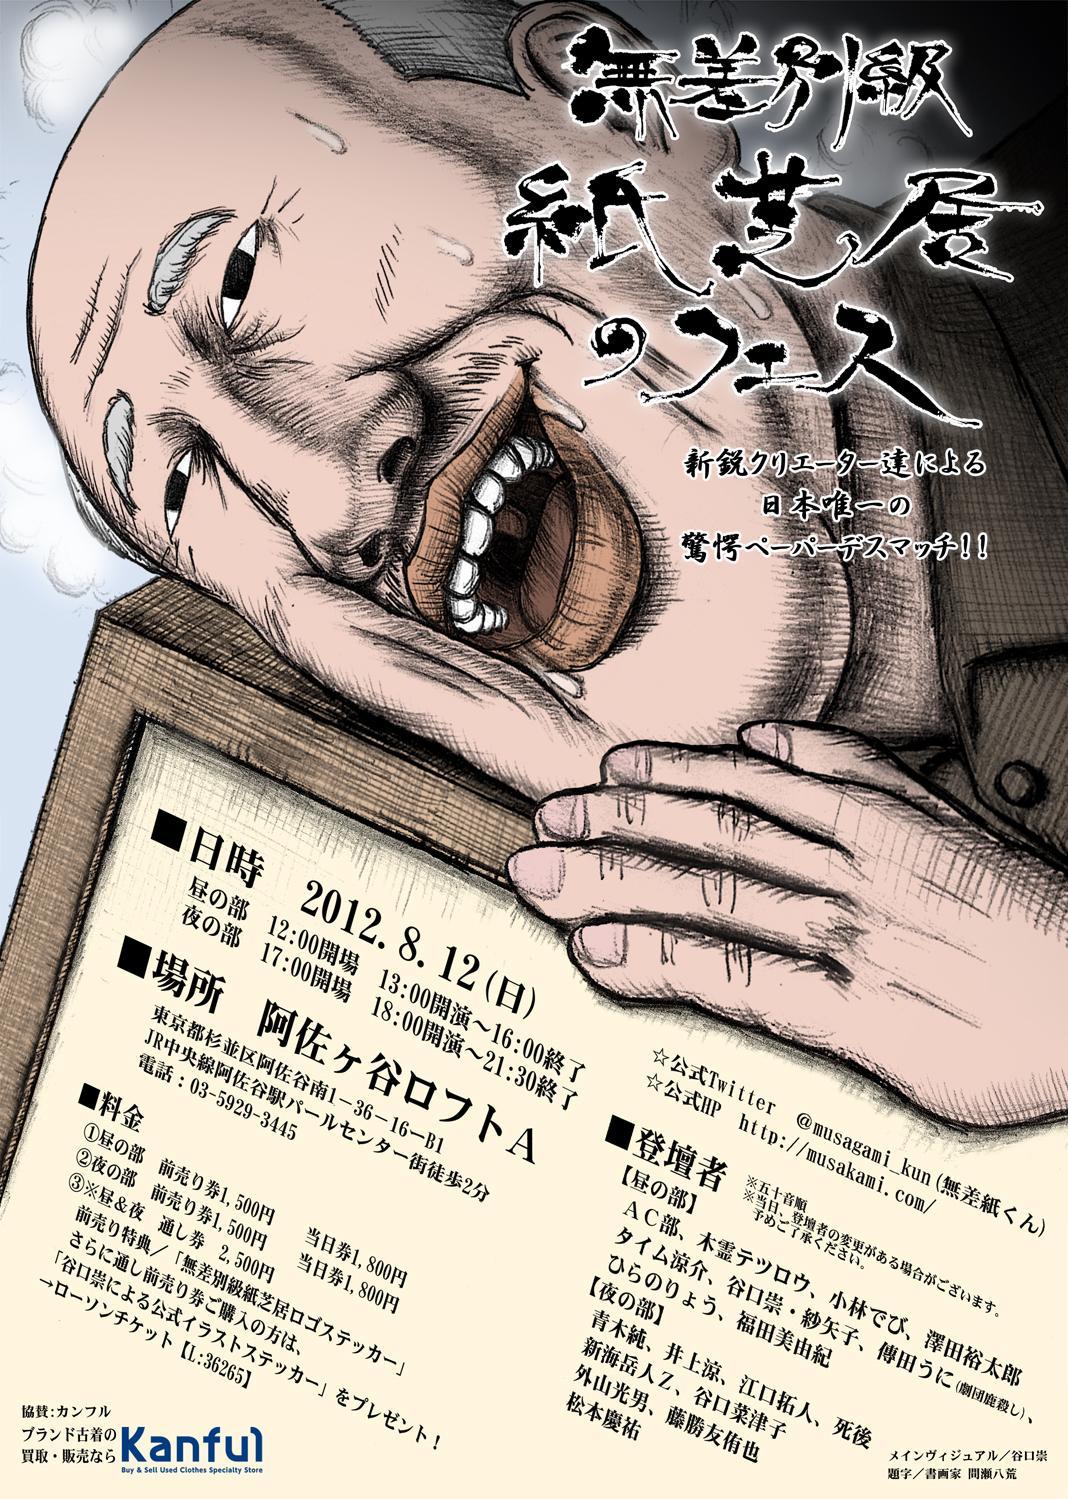 告知 : 8月12日「無差別級紙芝居のフェス」に出演_d0151007_16382021.jpg